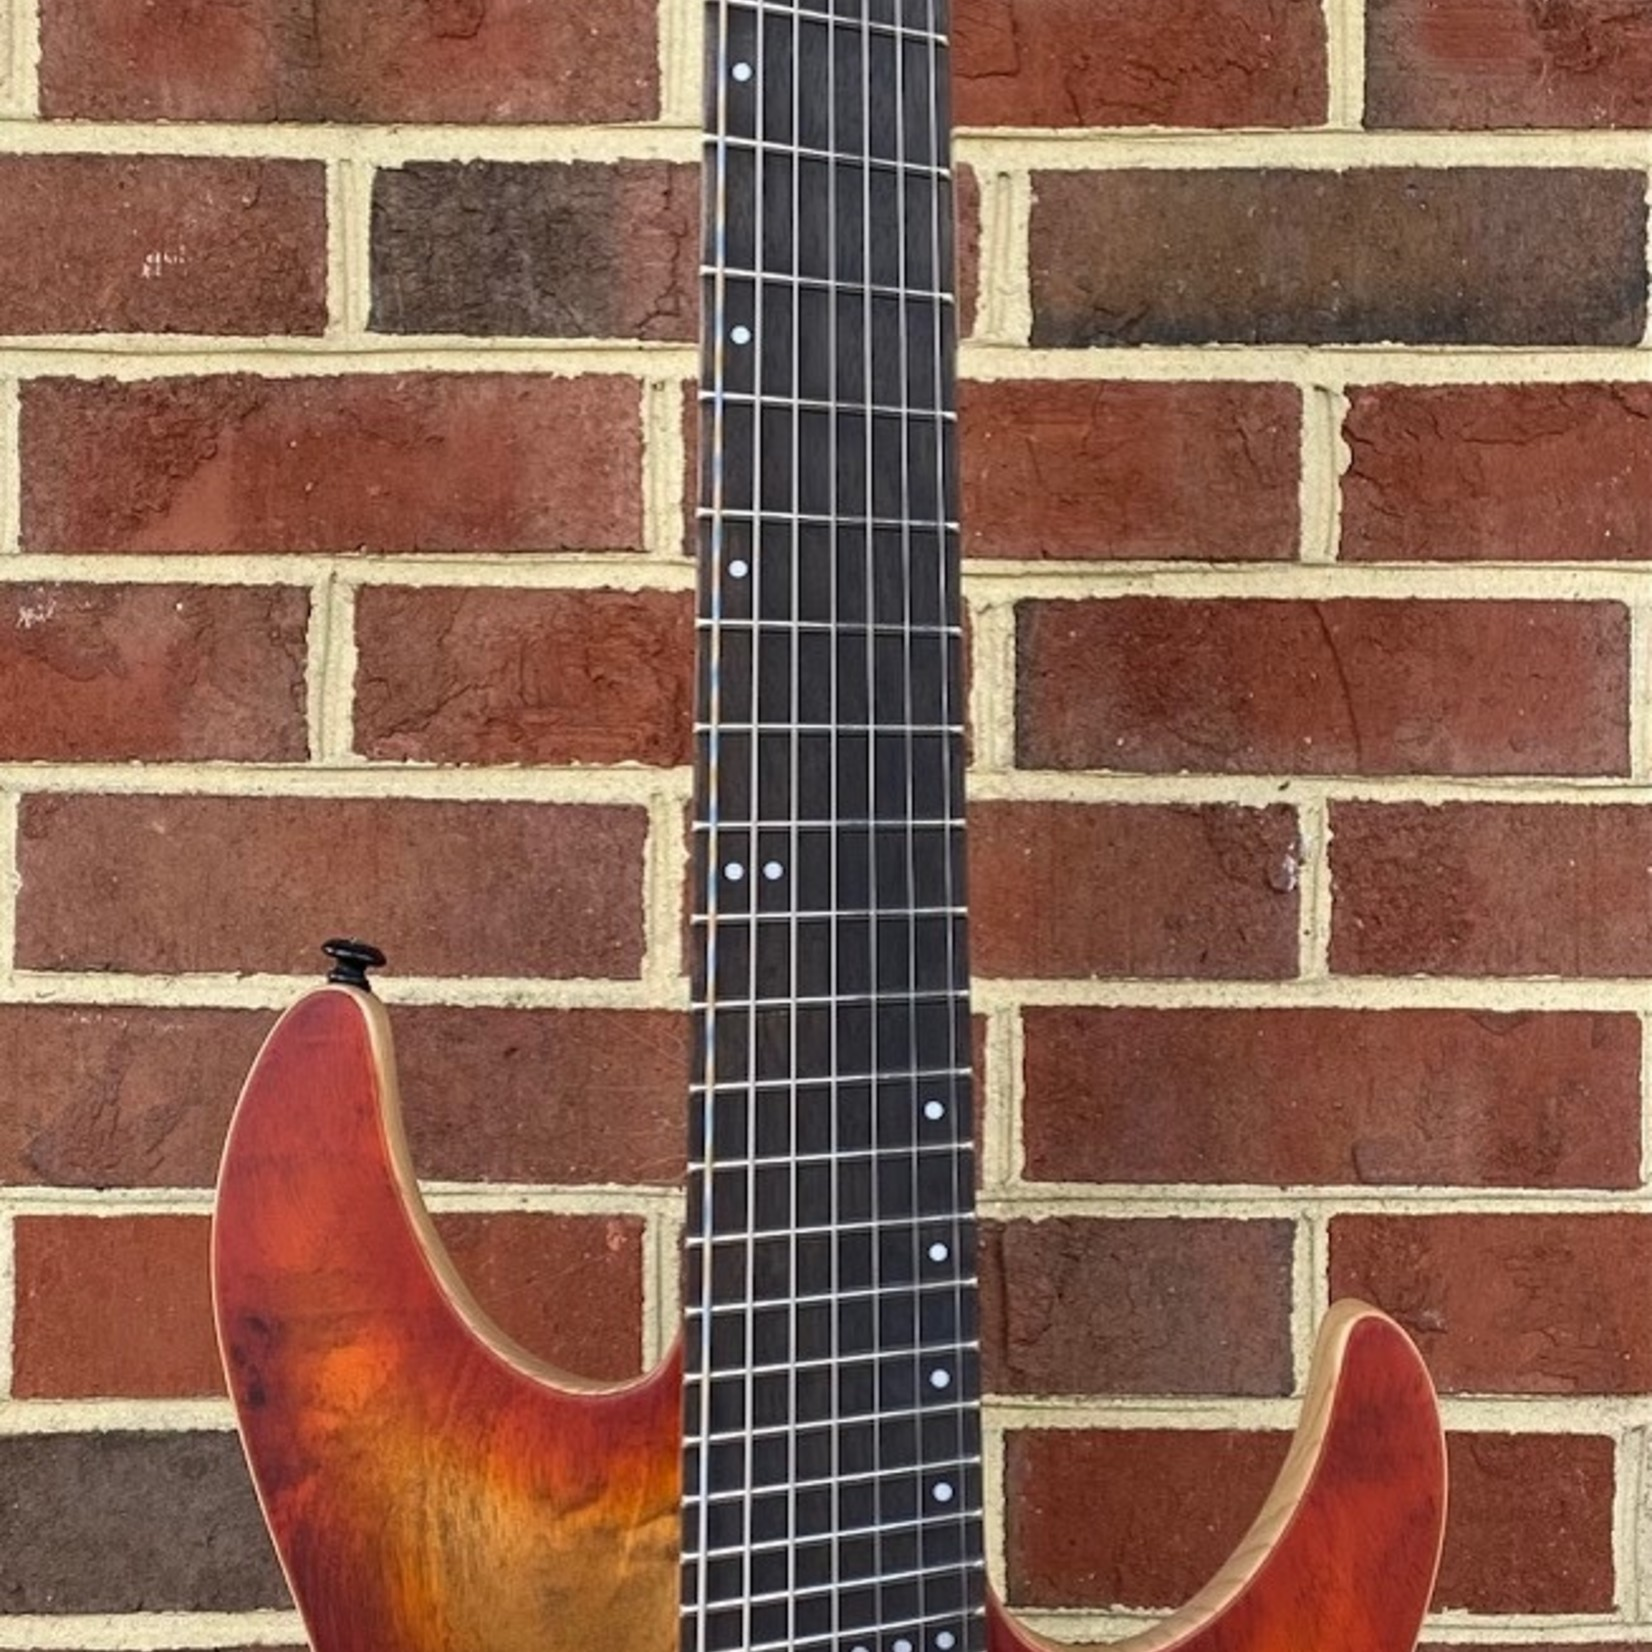 Schecter Guitar Research Schecter Reaper-7 Multiscale, Infernoburst, Poplar Burl Top, Ebony Fretboard, Maple/Walnut 5pc Neck, Hipshot Hardtail w/ String-Thru Body, Swamp Ash Body